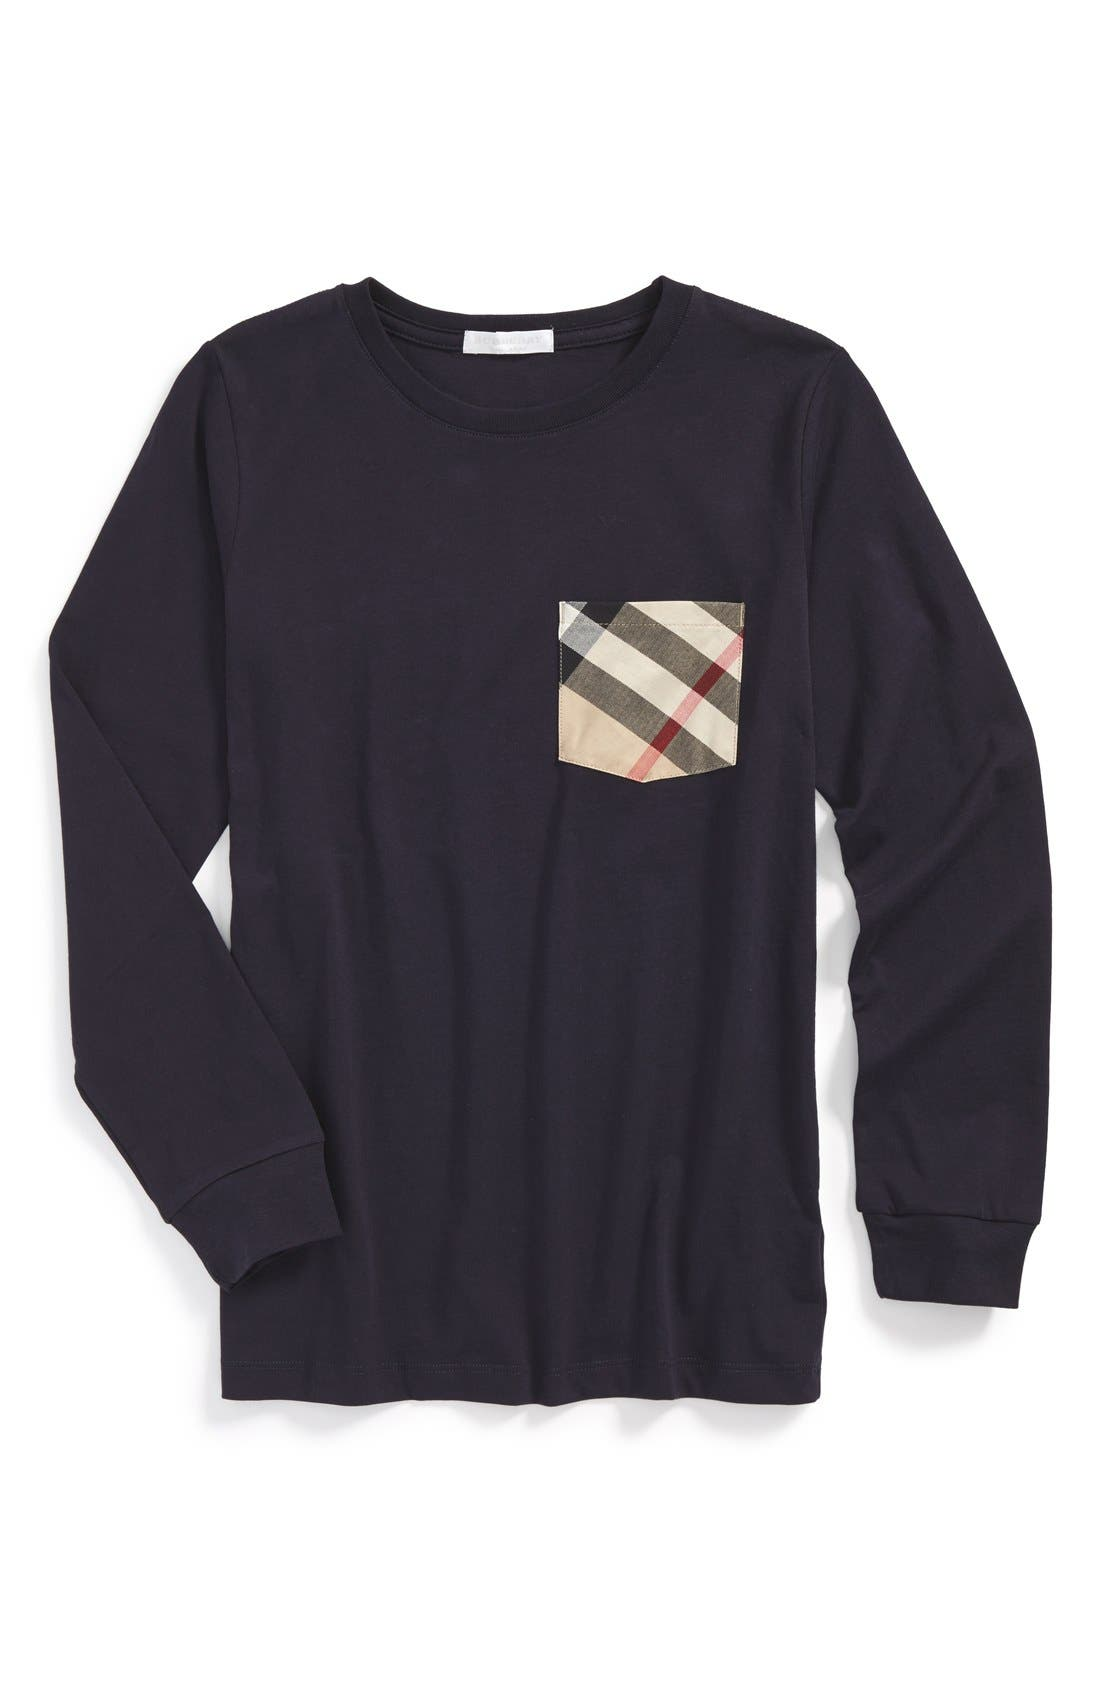 Burberry Check Print Chest Pocket T-Shirt (Little Boys & Big Boys)